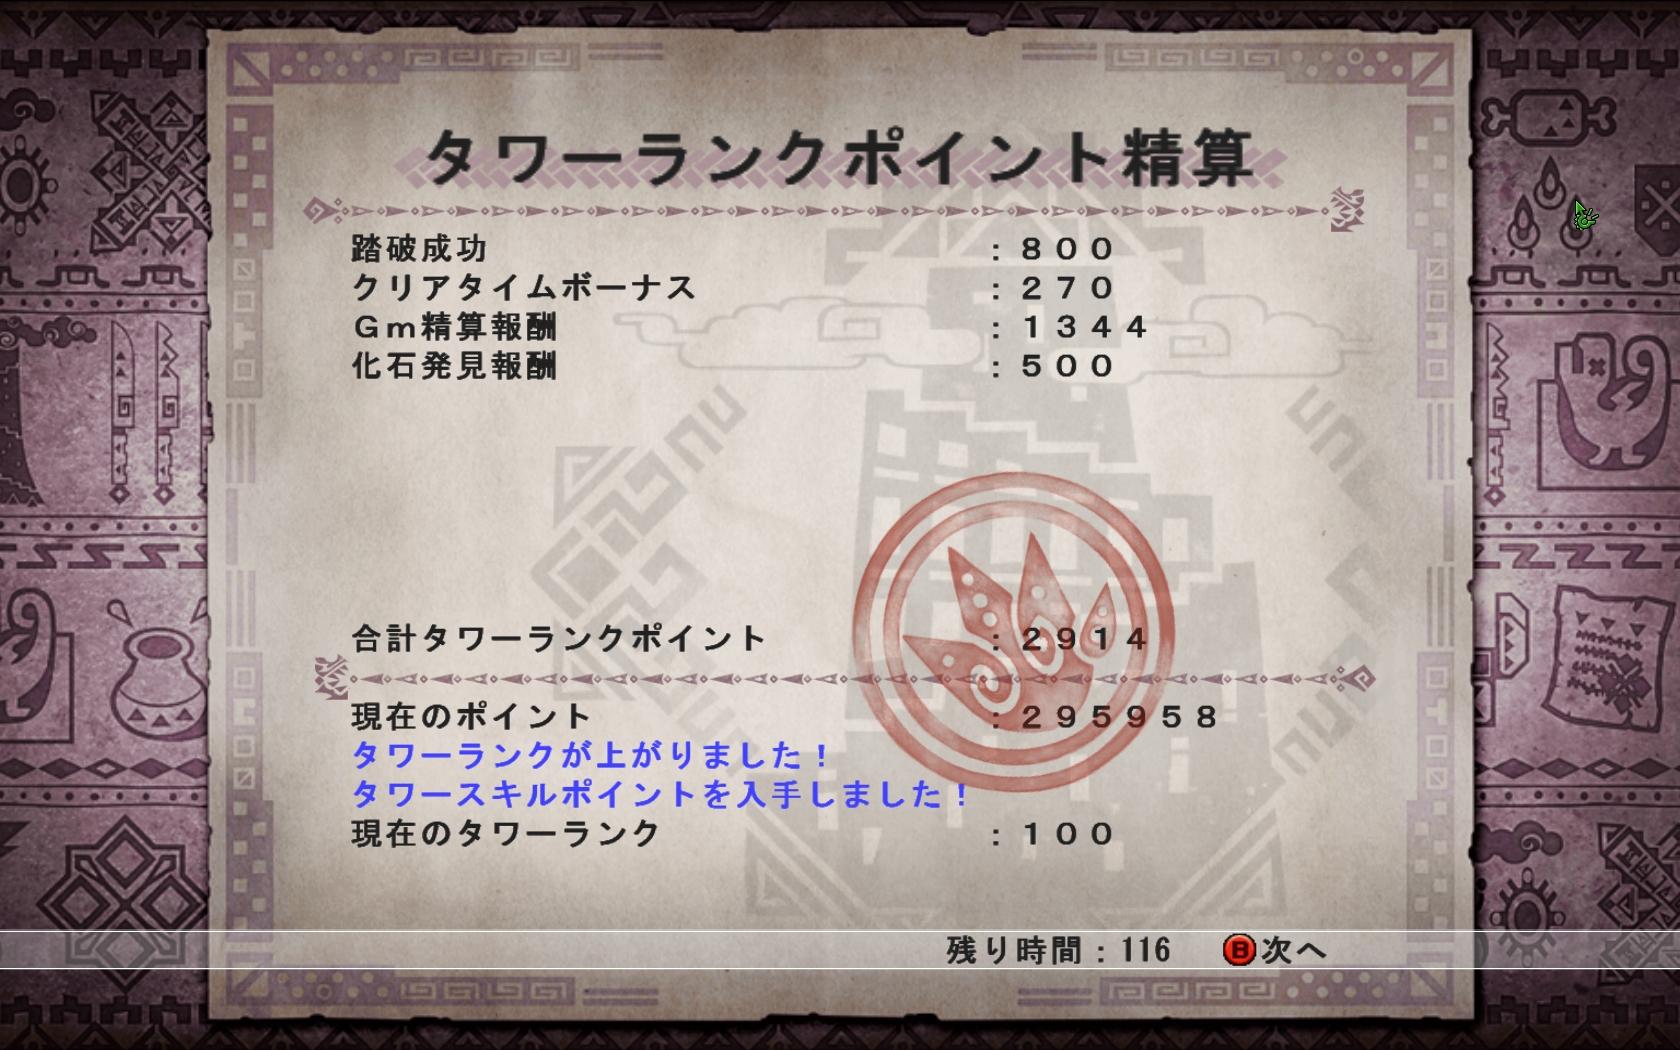 mhf_20151102_103454_150.jpg